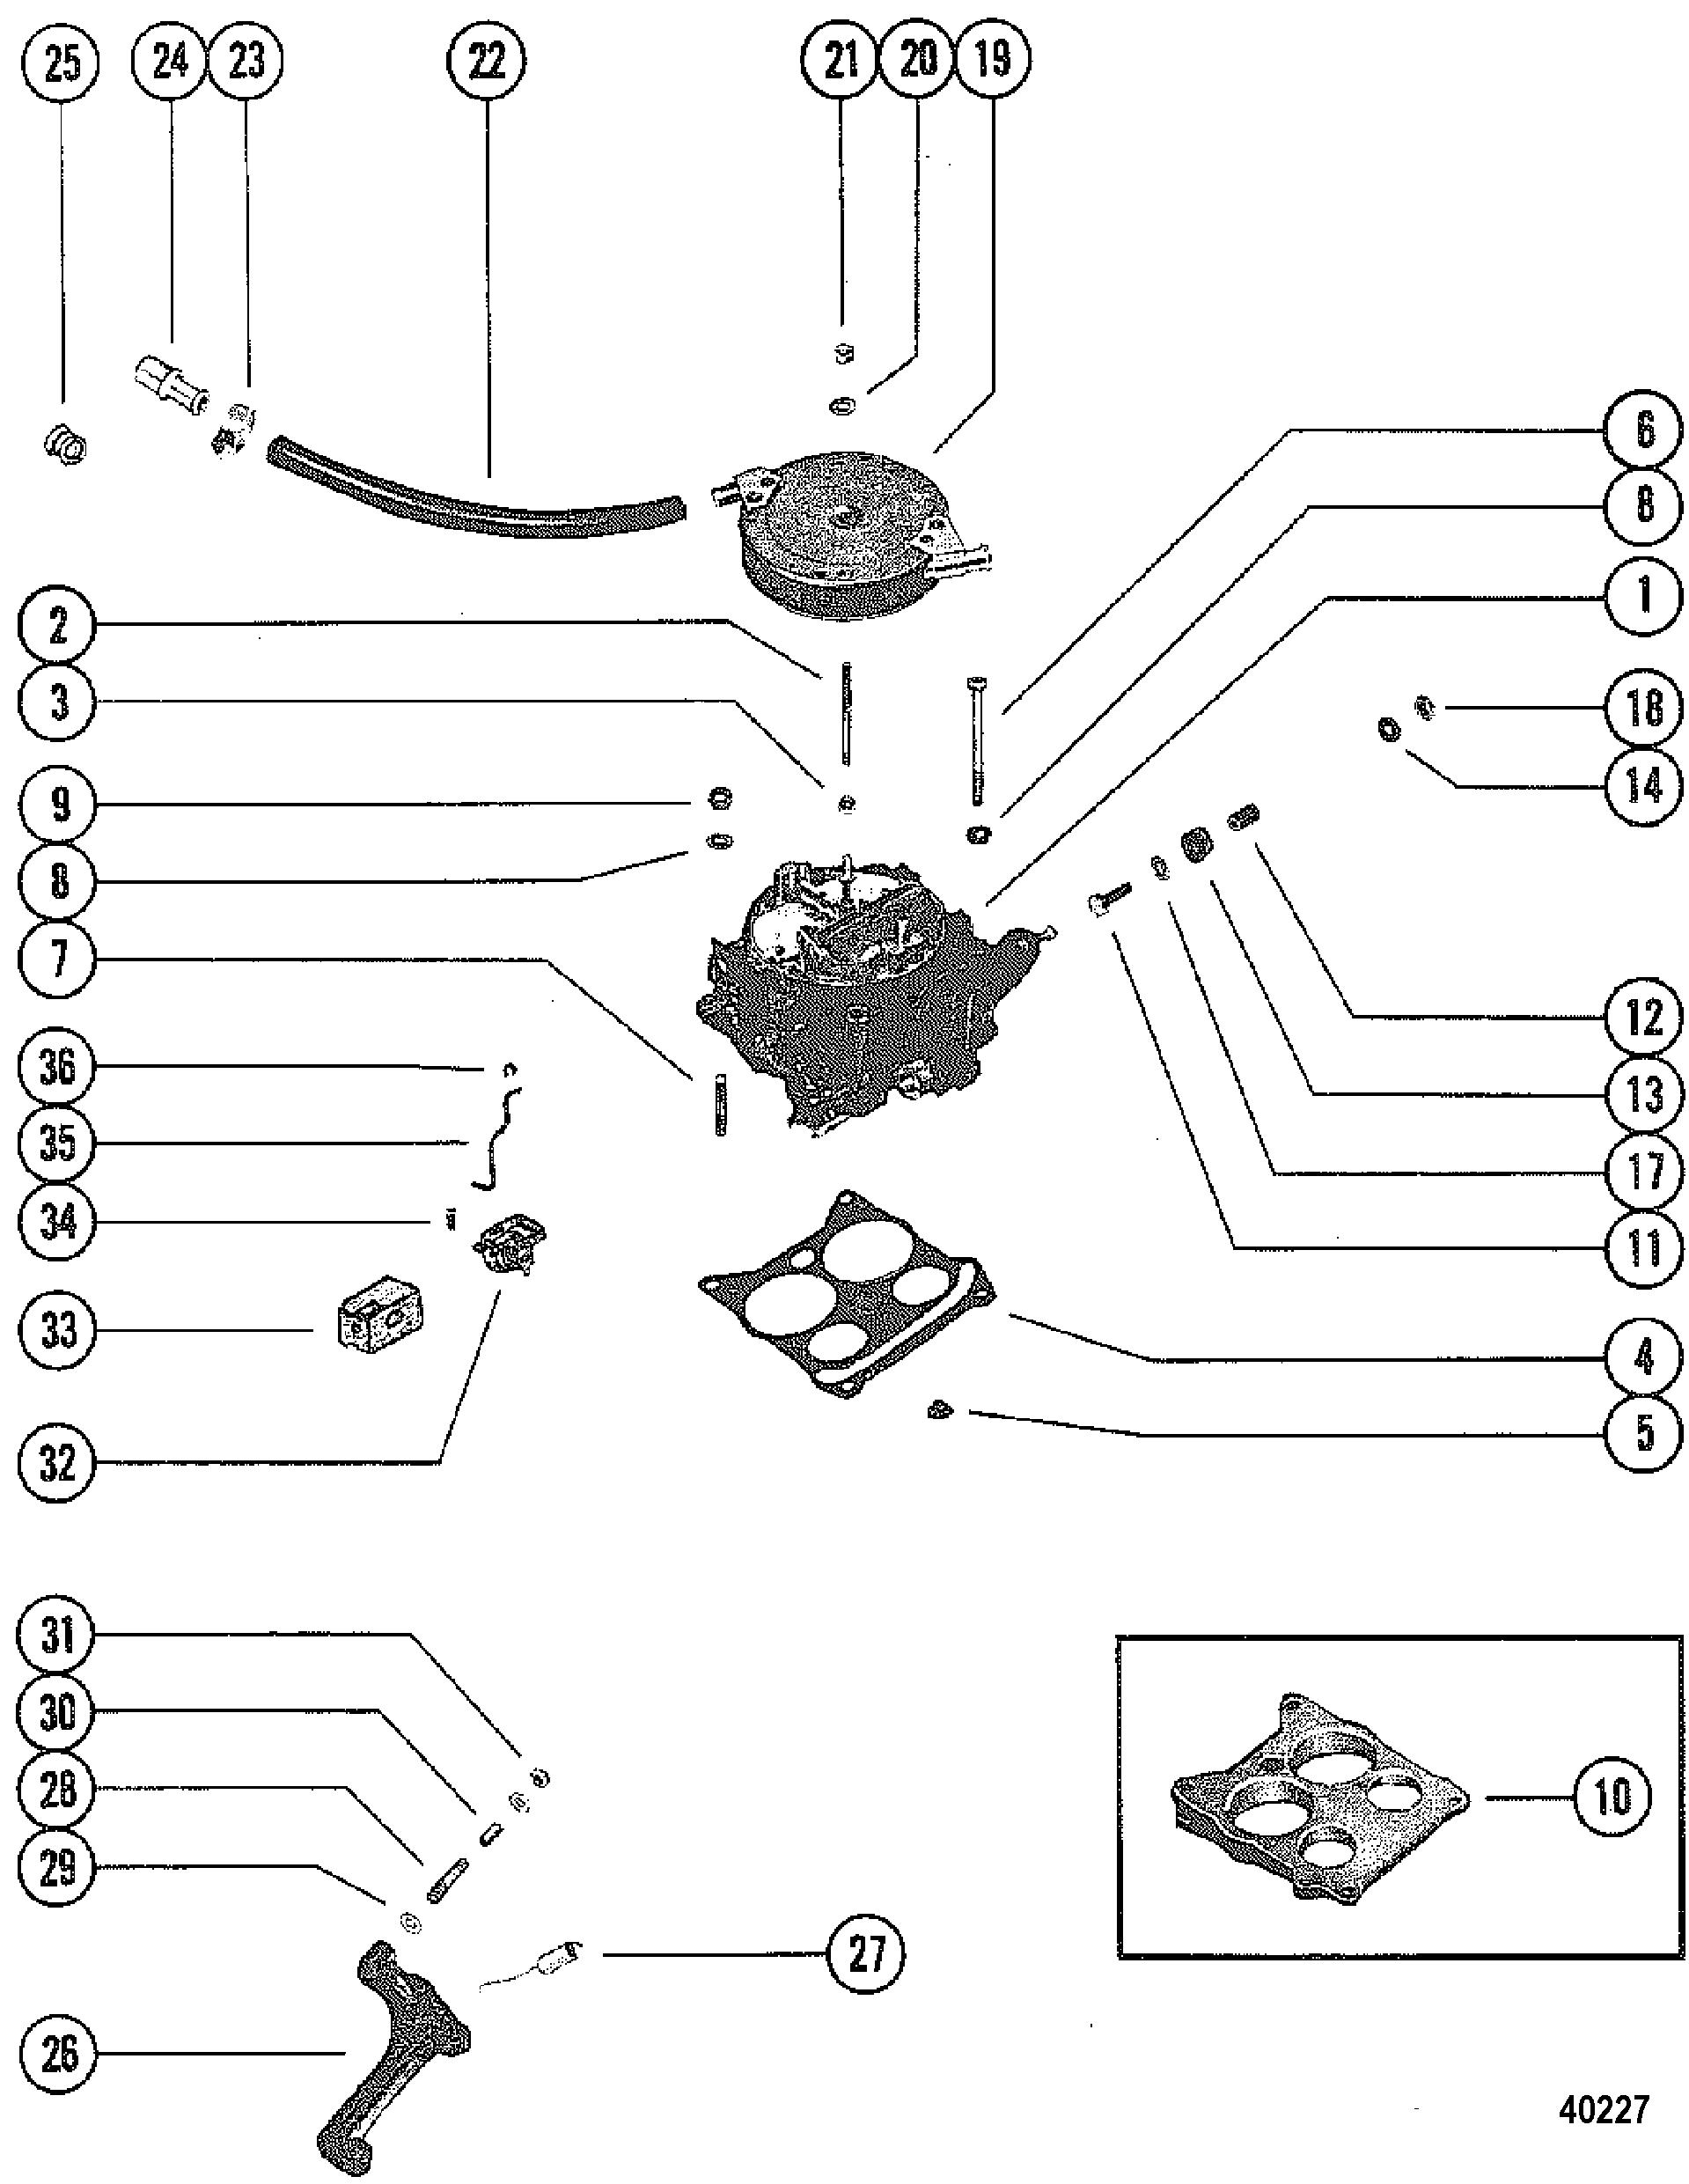 CARBURETOR AND AUTOMATIC CHOKE FOR MERCRUISER 228 ENGINE G.M.